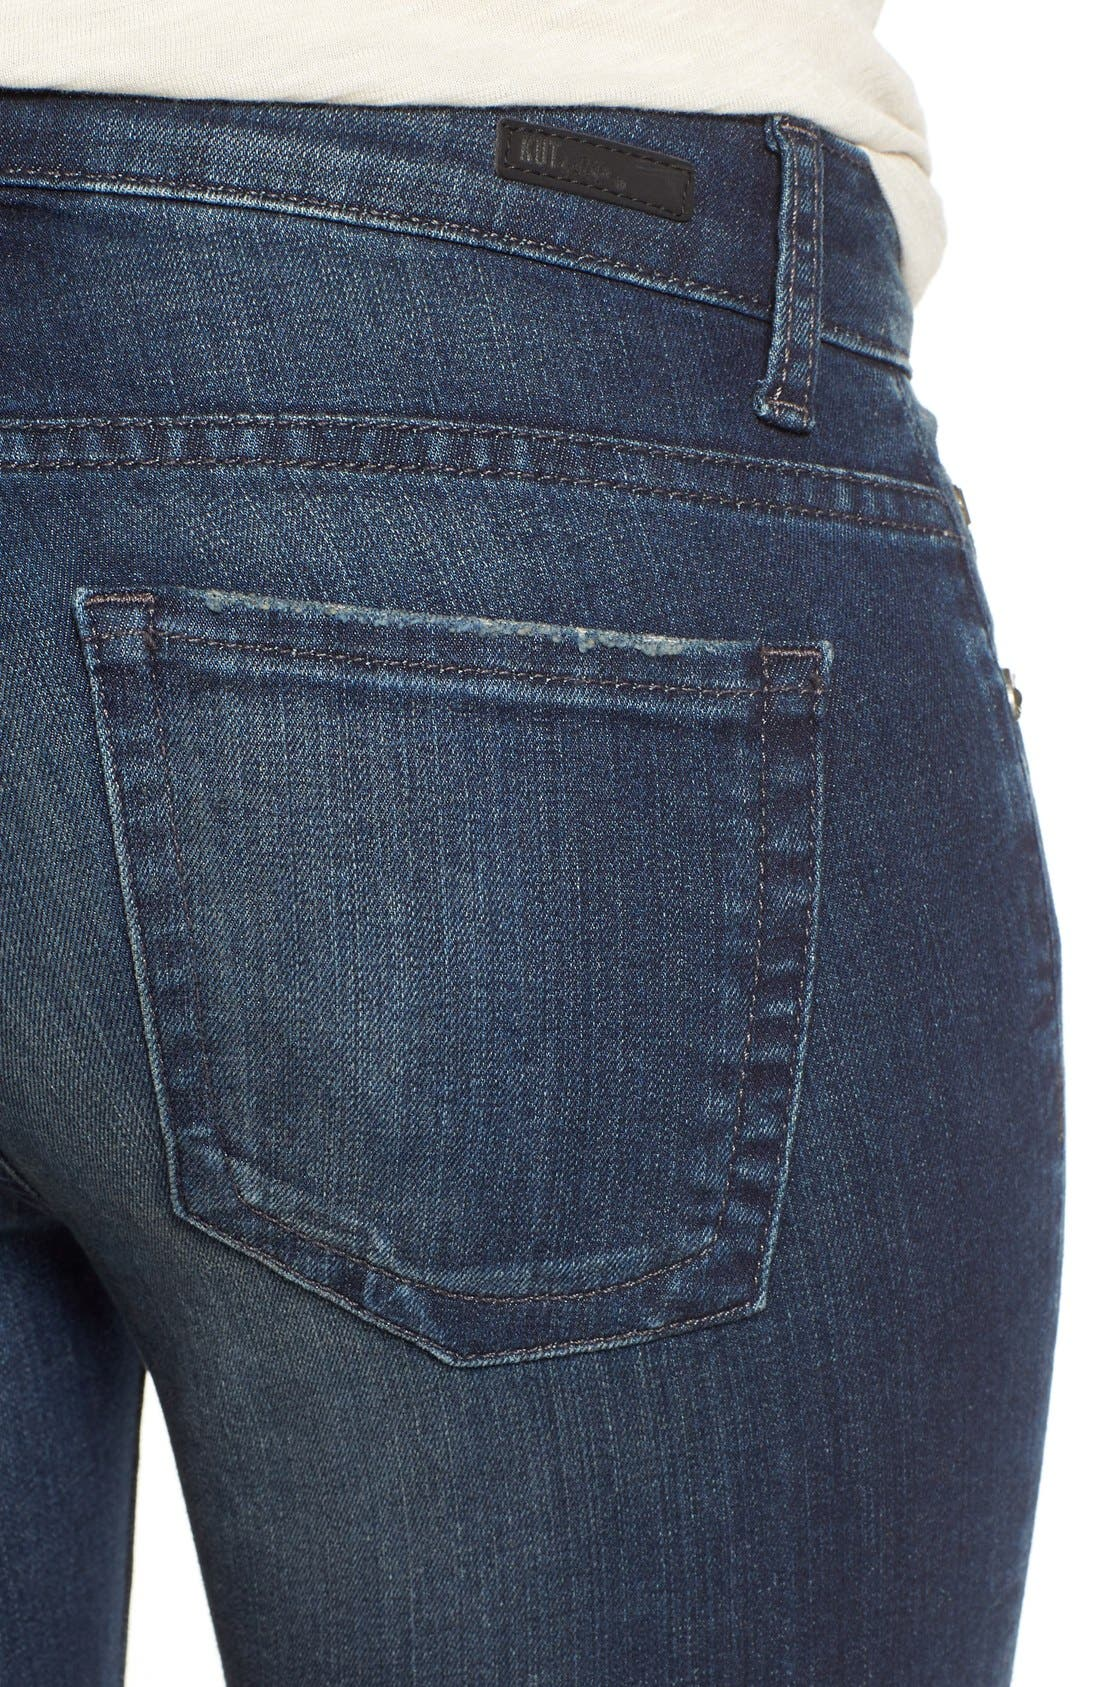 'Catherine' Slim Boyfriend Jeans,                             Alternate thumbnail 4, color,                             CAREFULNESS